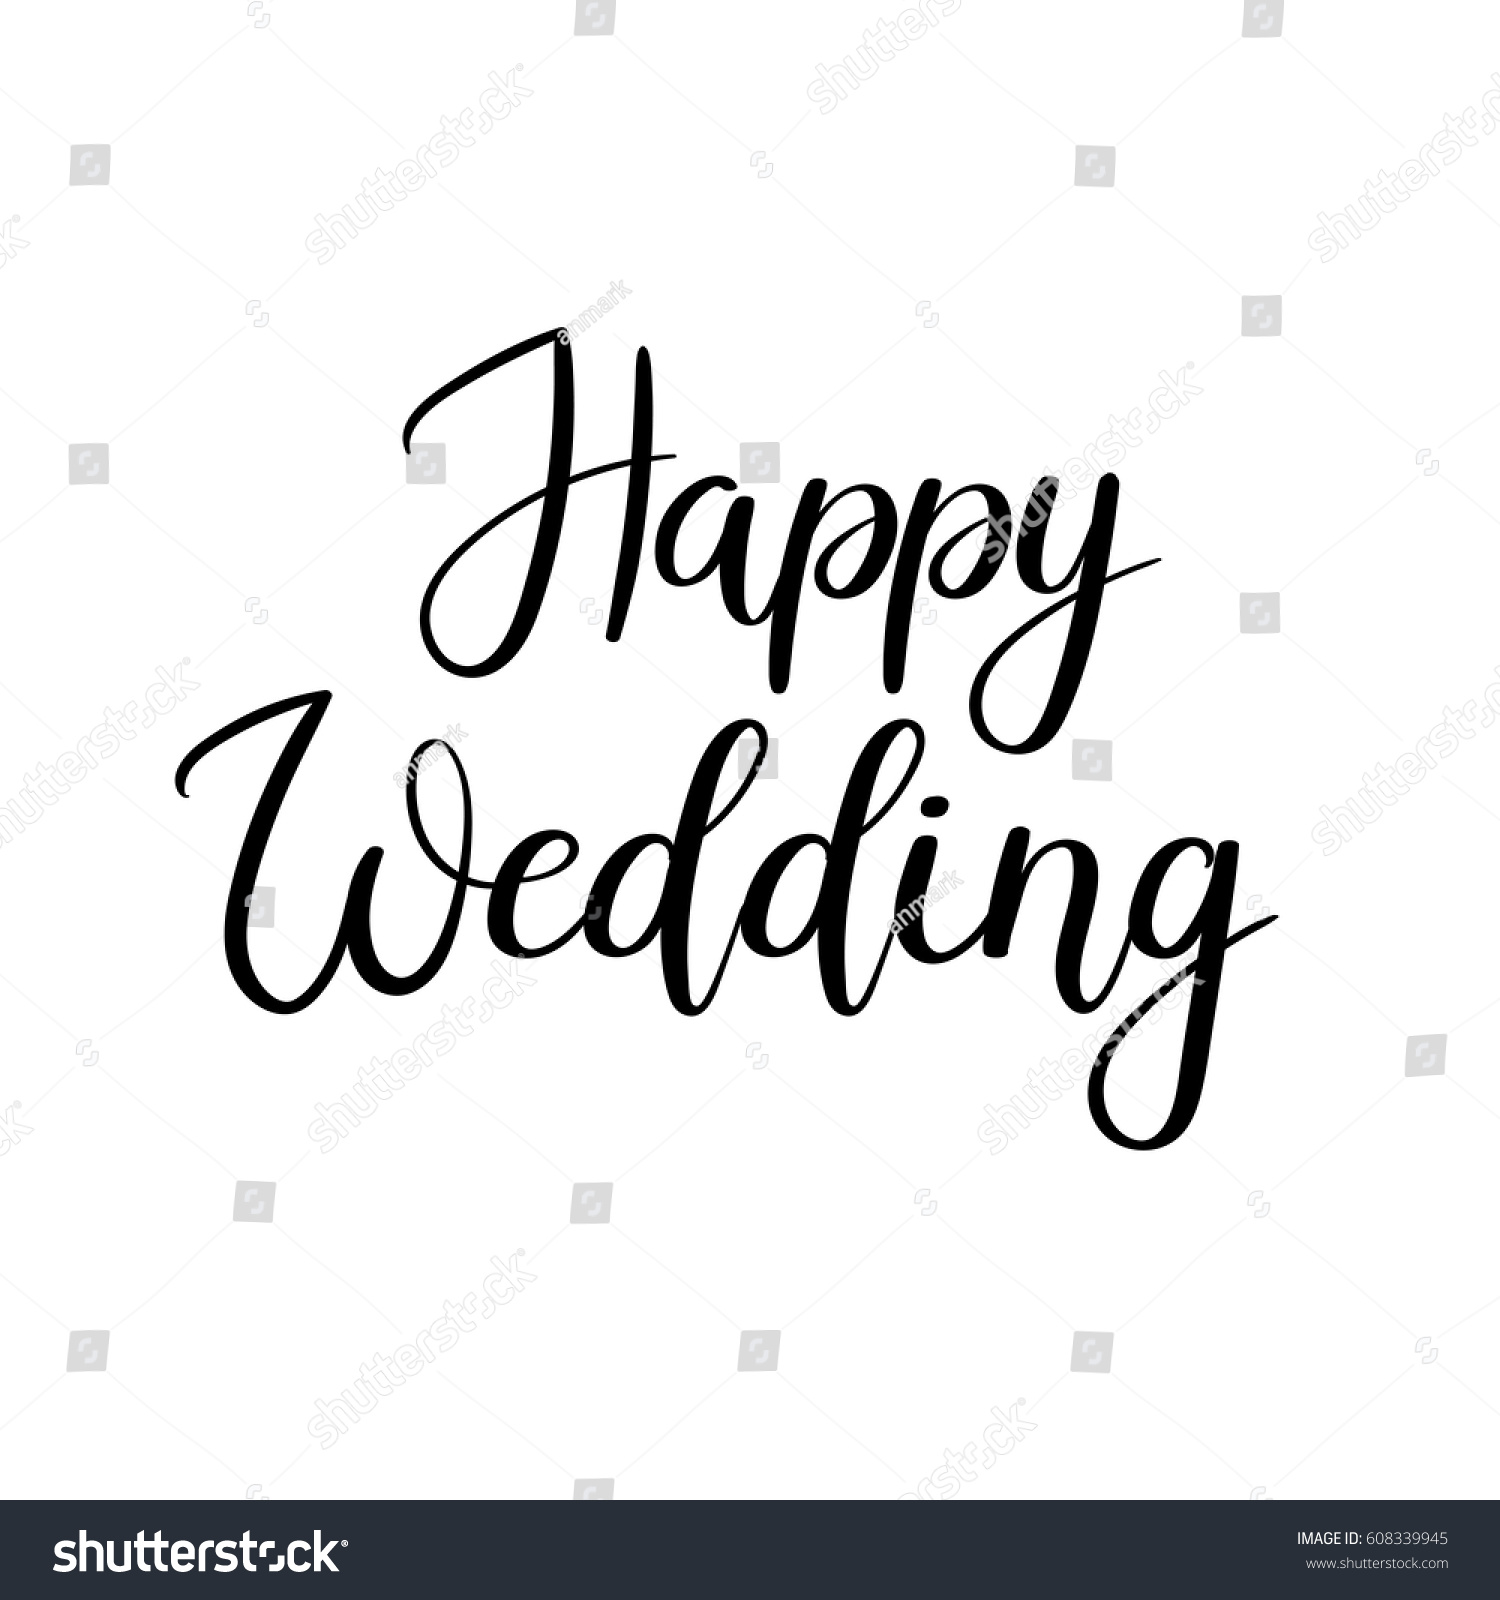 Happy Wedding Hand Lettering Text Calligraphy Stock Vector ...